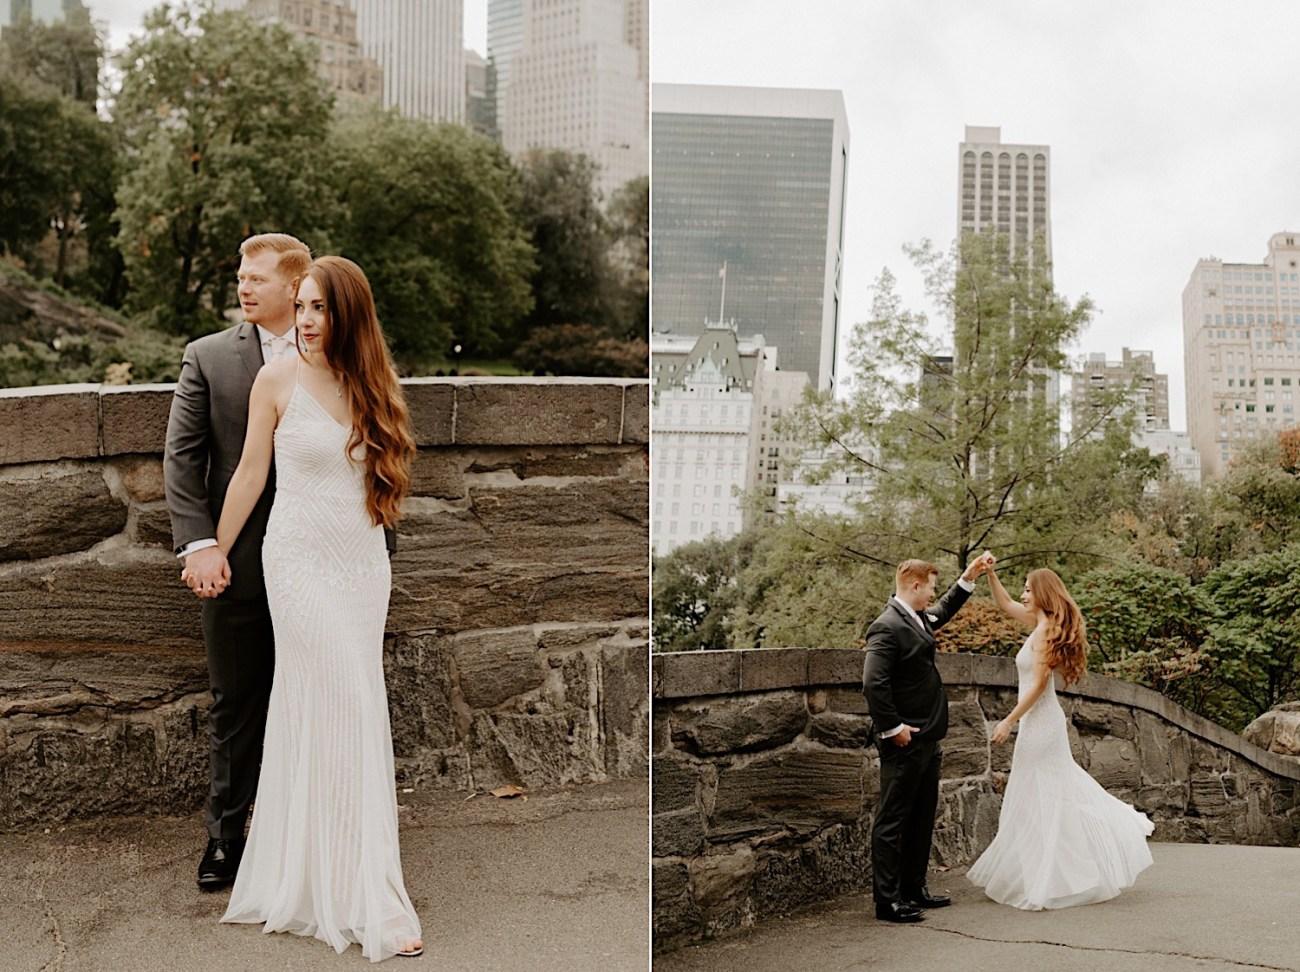 Central Park Wedding Photos Central Park Elopement NYC Wedding Photographer 05